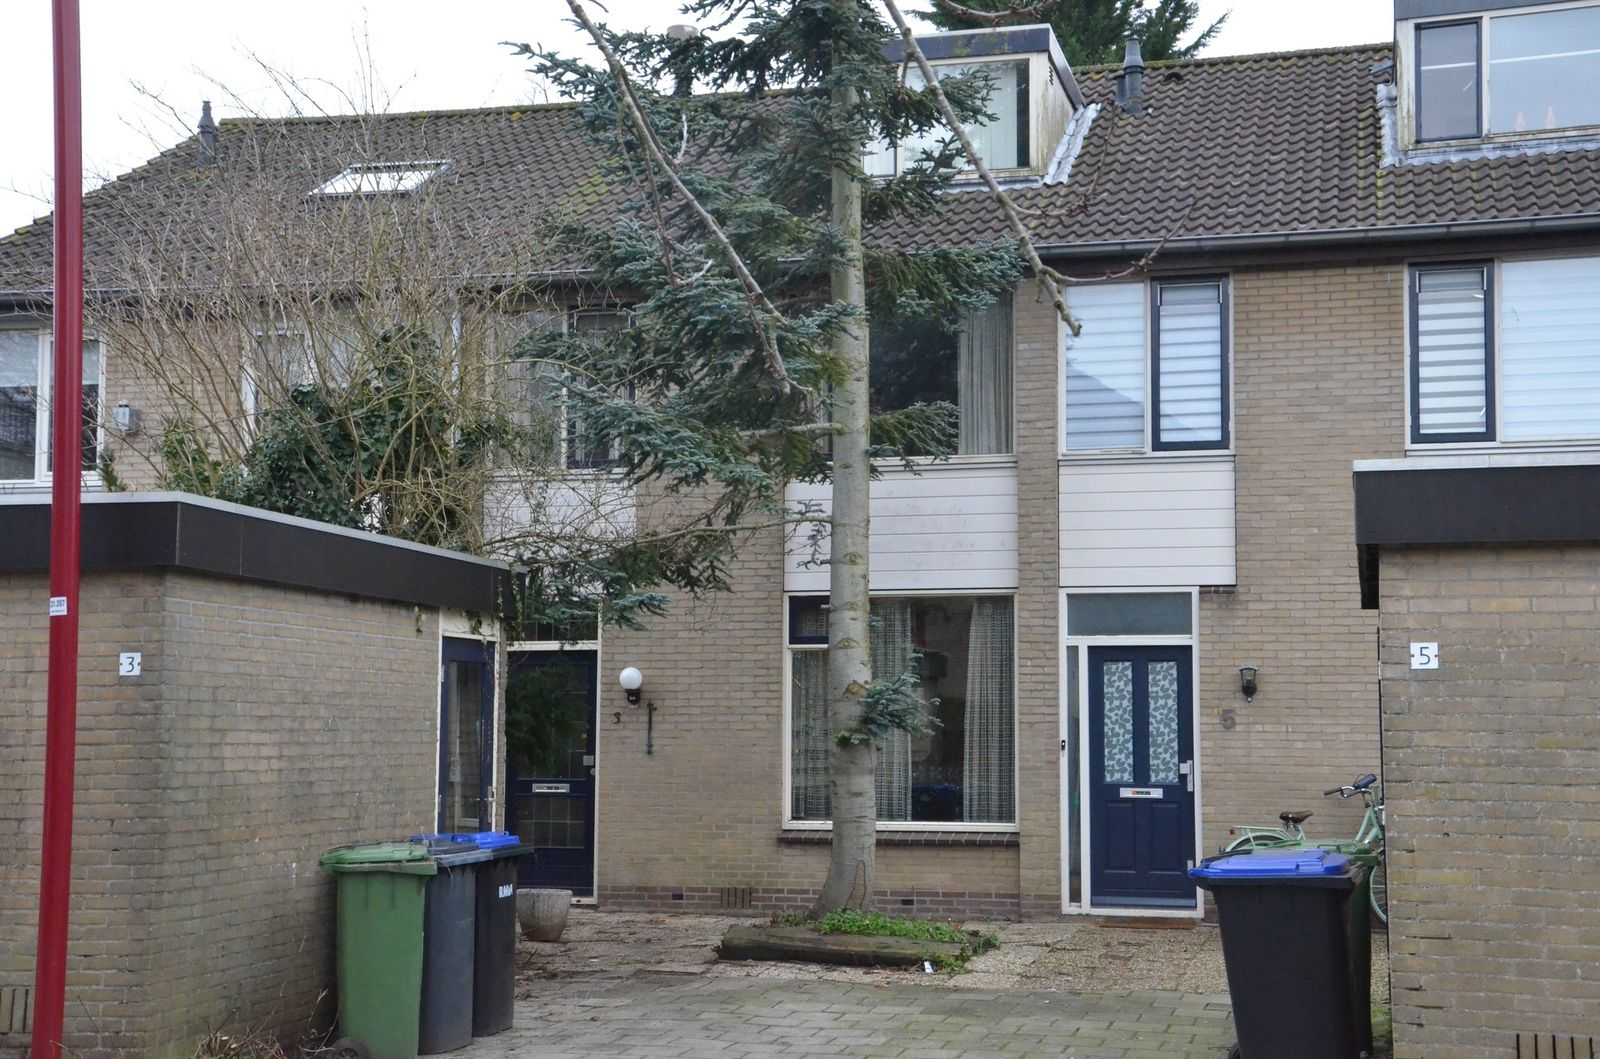 Mr. J.M.M. Hamersstraat 3, Nieuwegein